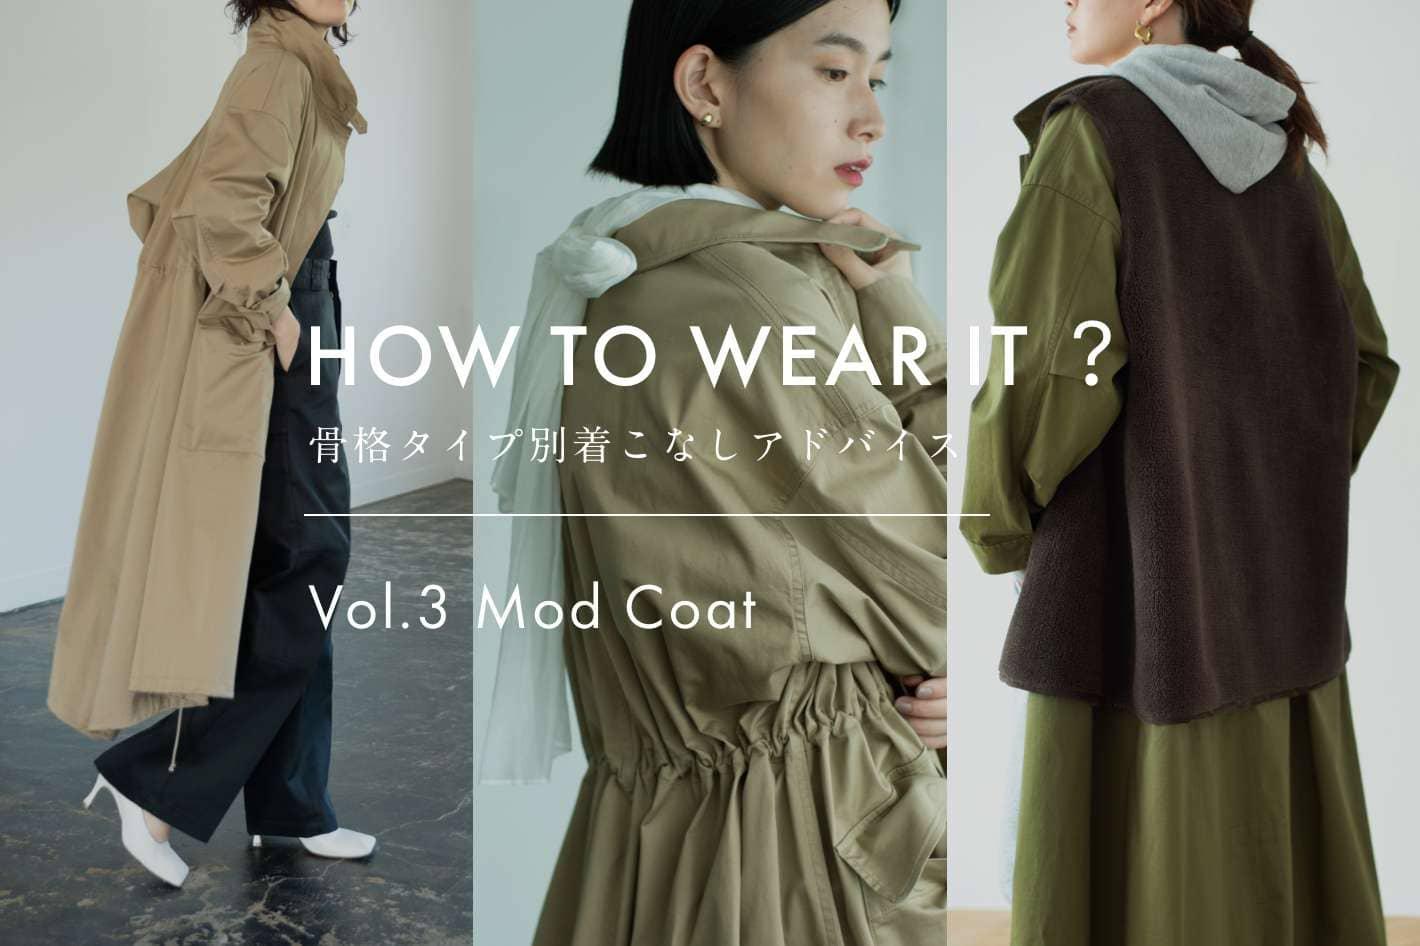 GALLARDAGALANTE どう着れば正解?骨格タイプ別着こなしアドバイス Vol.3 Mod Coat